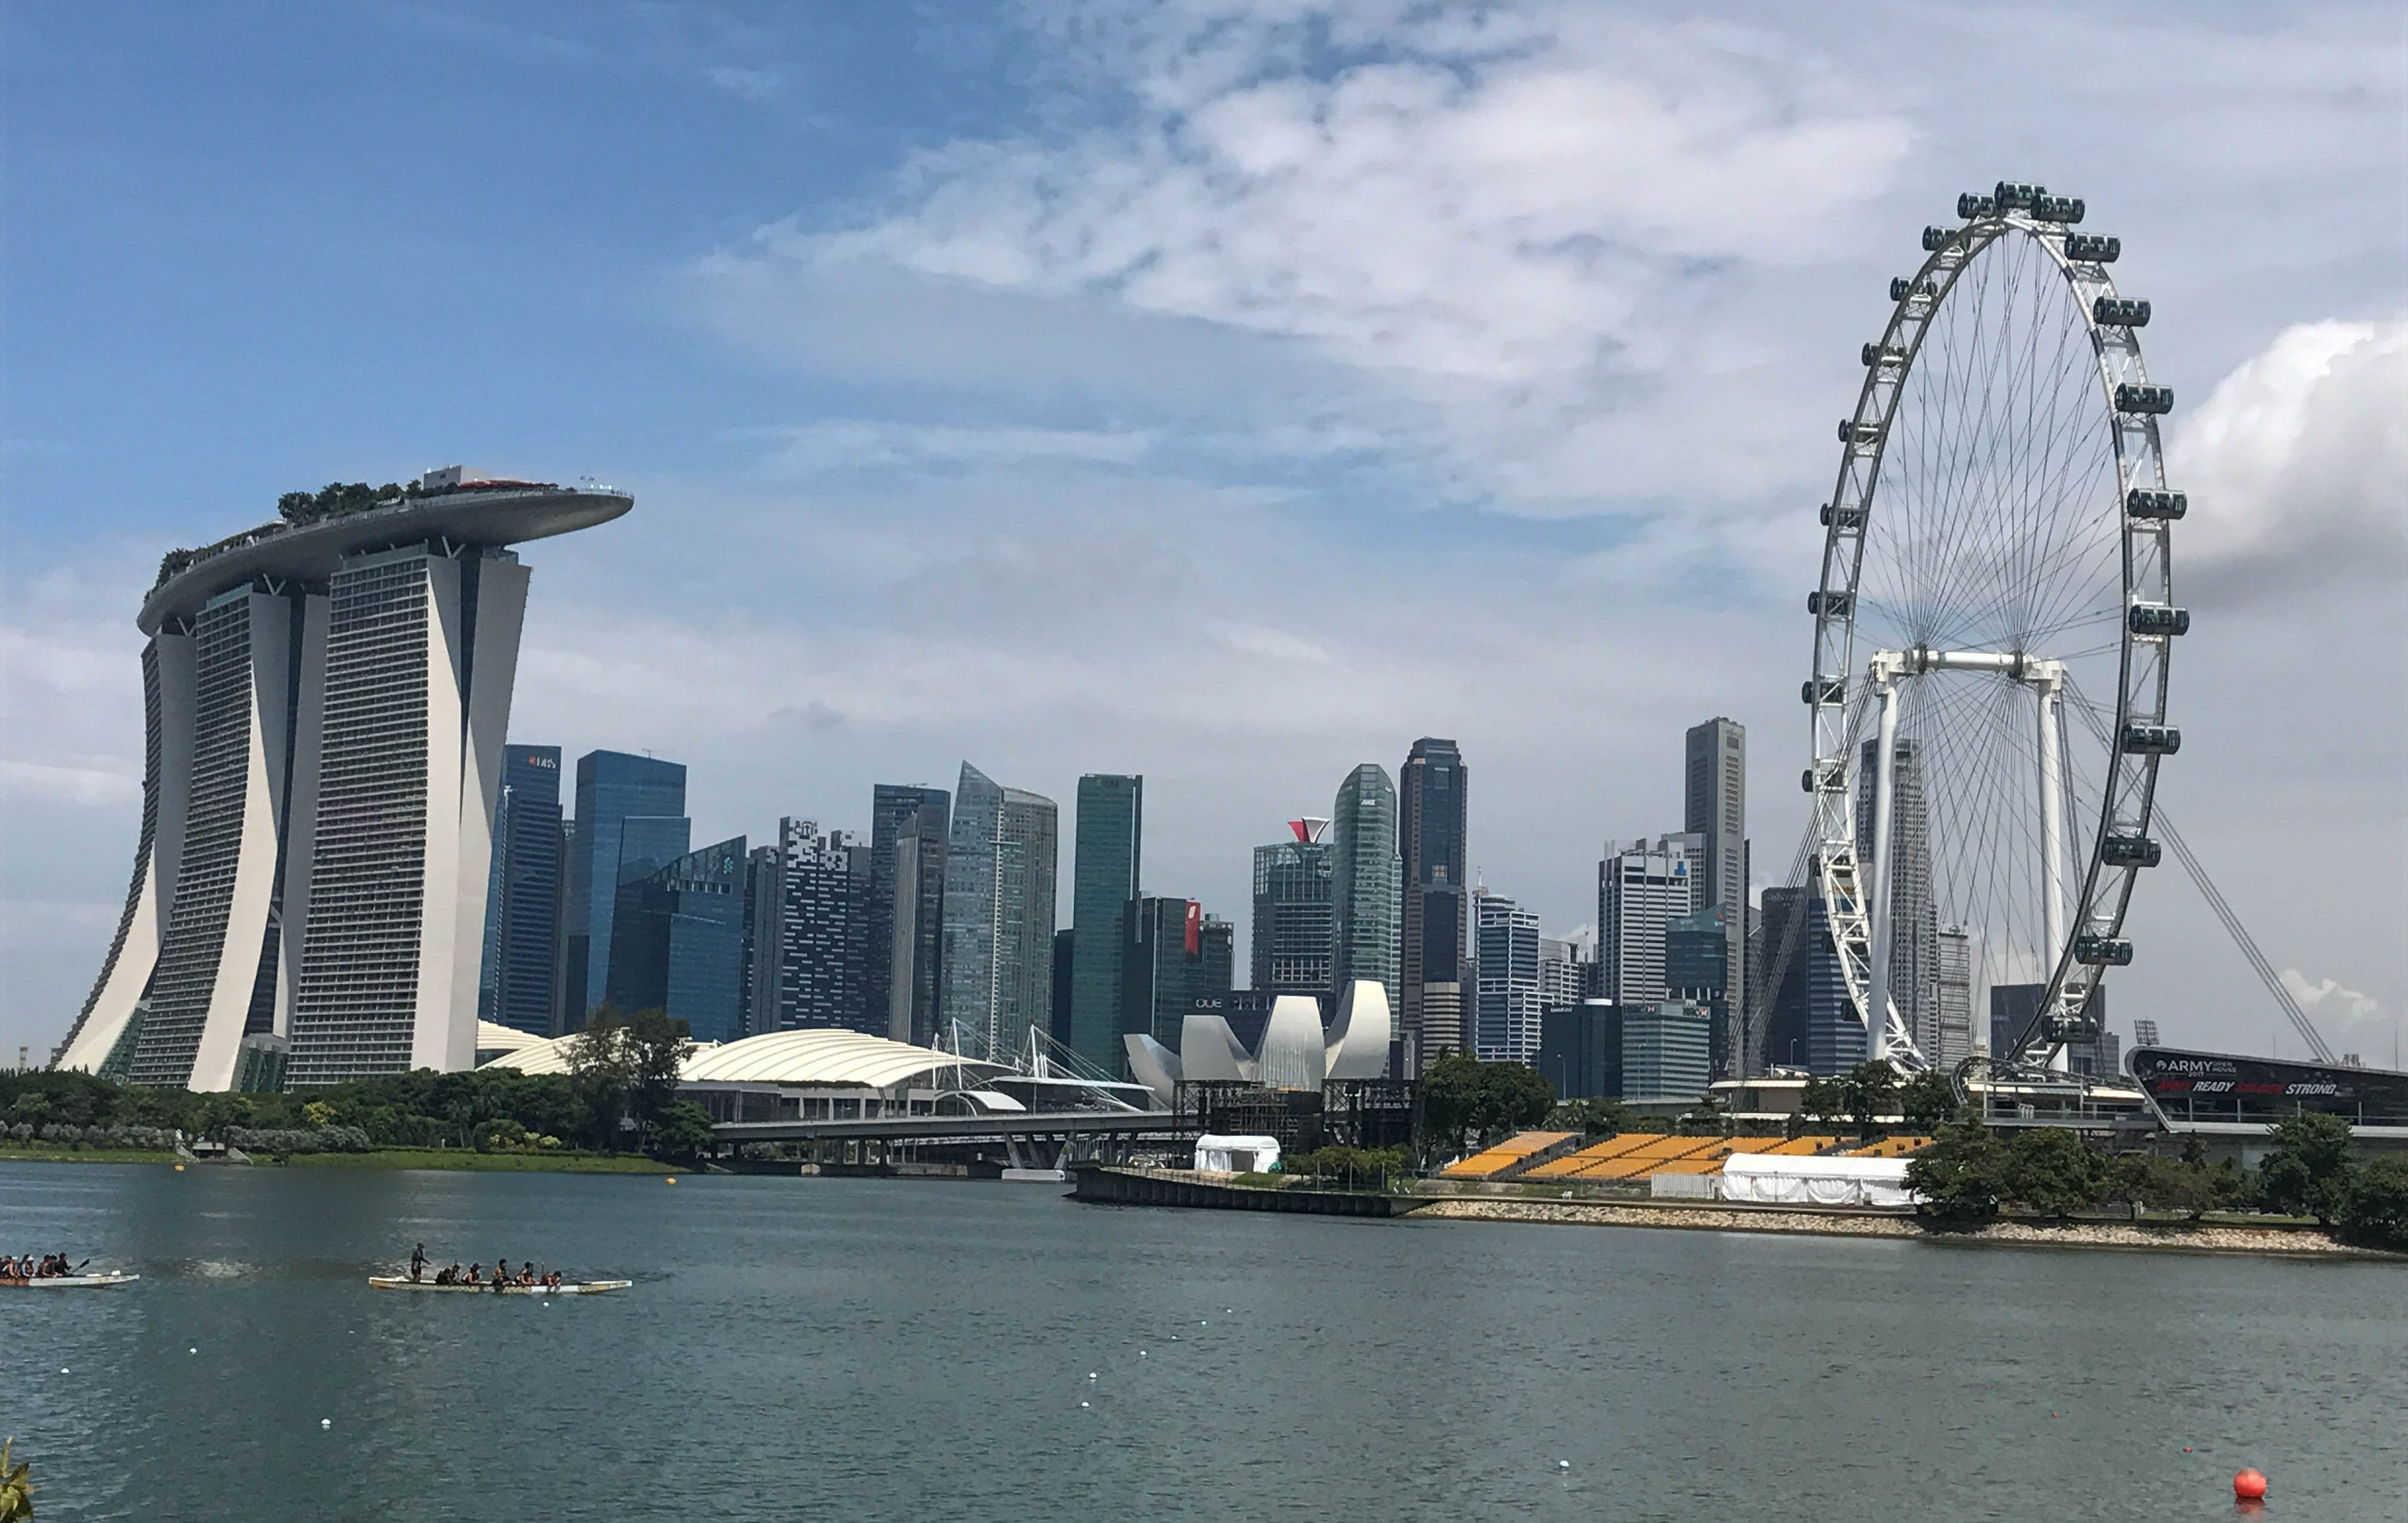 SINGAPORE LILY